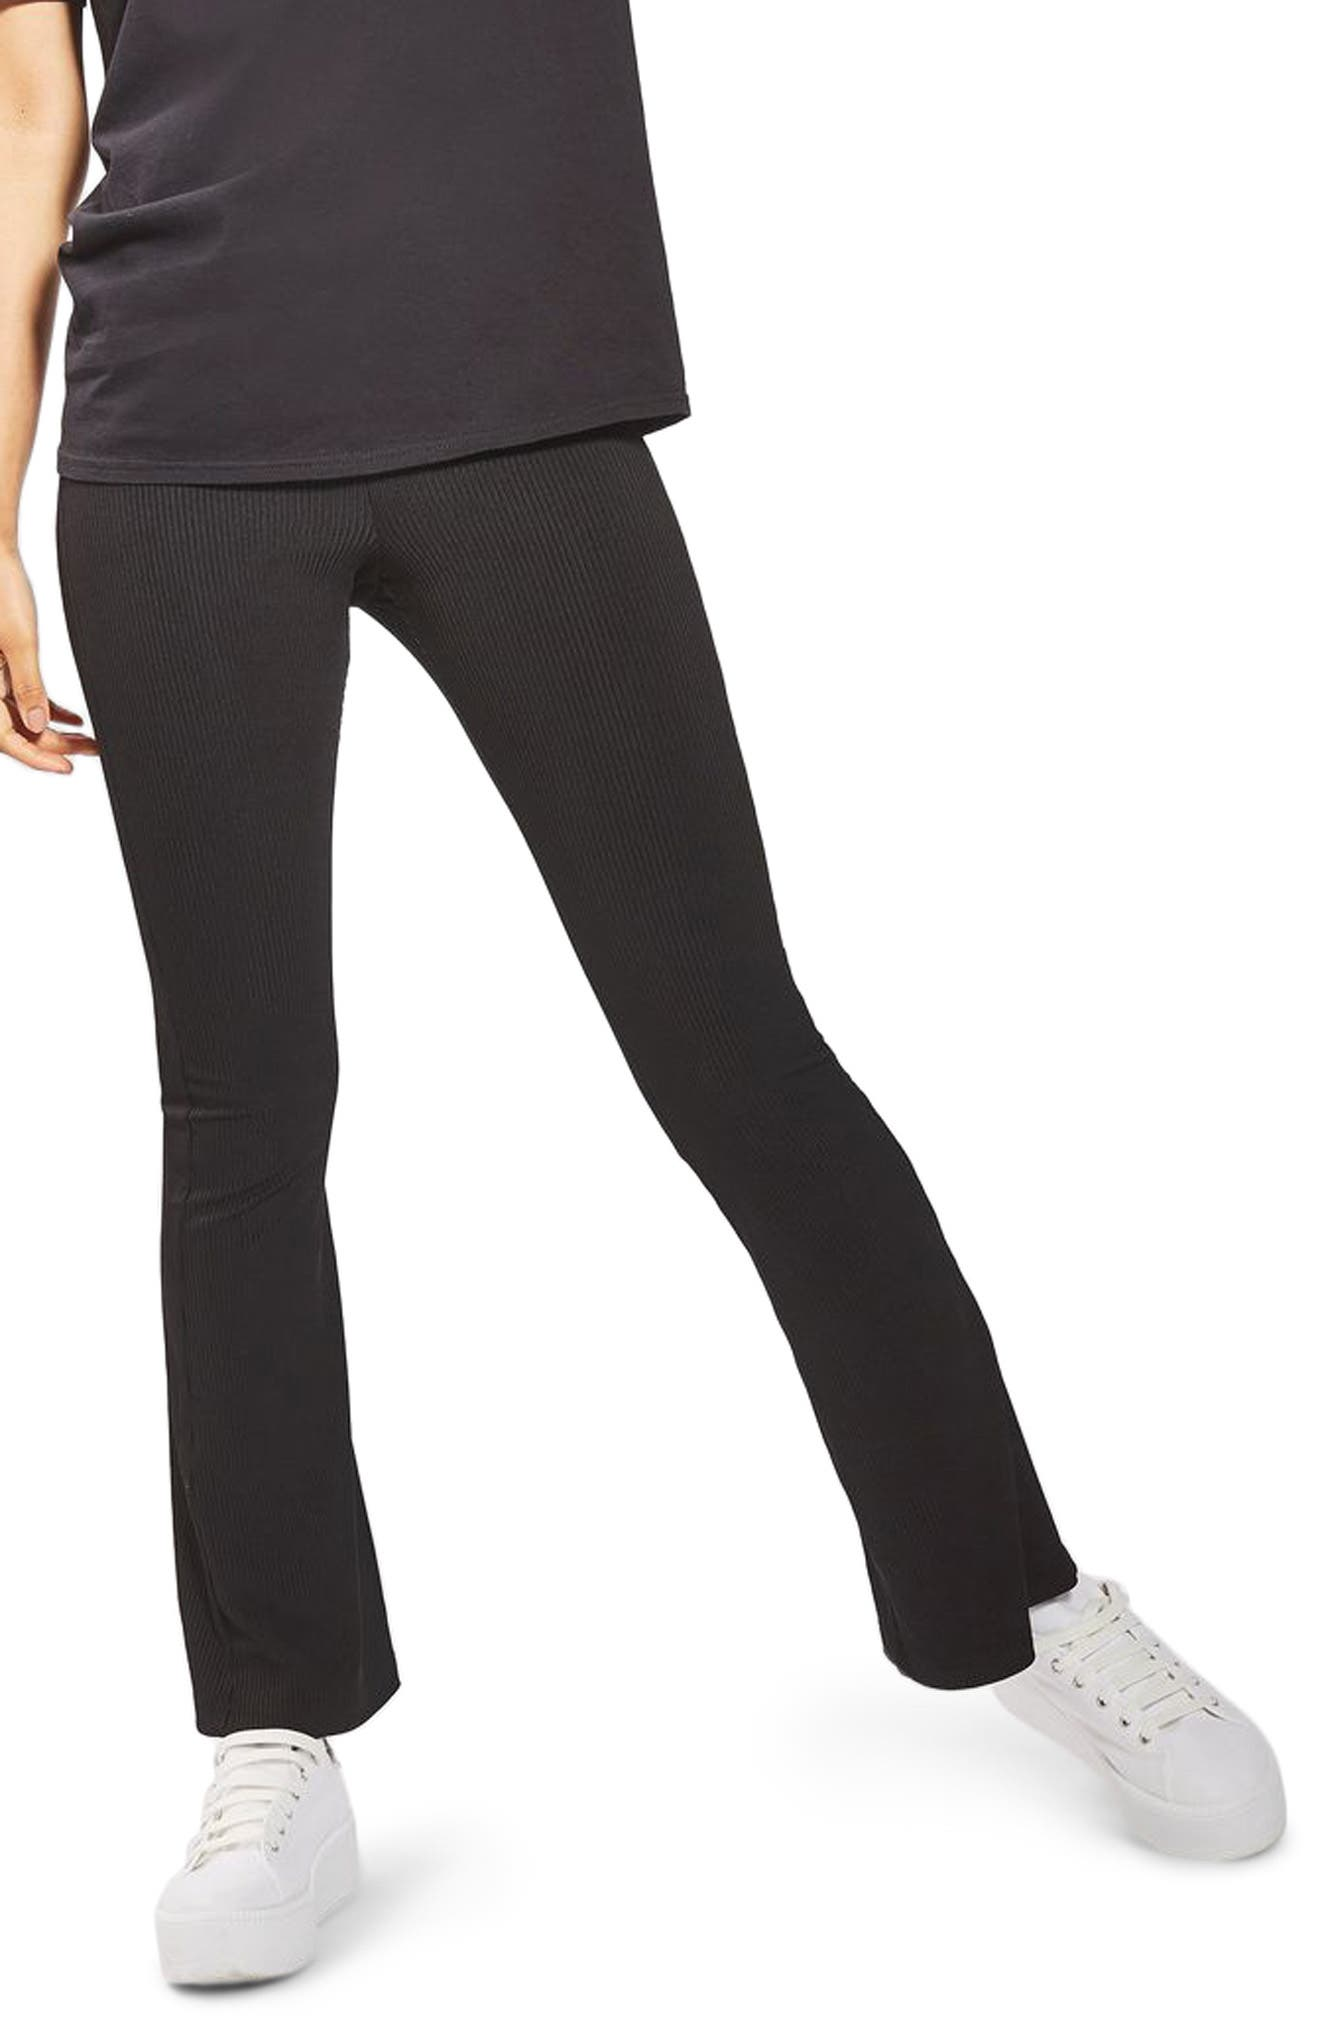 1455b5c16d Women's Topshop High-Waisted Pants & Leggings